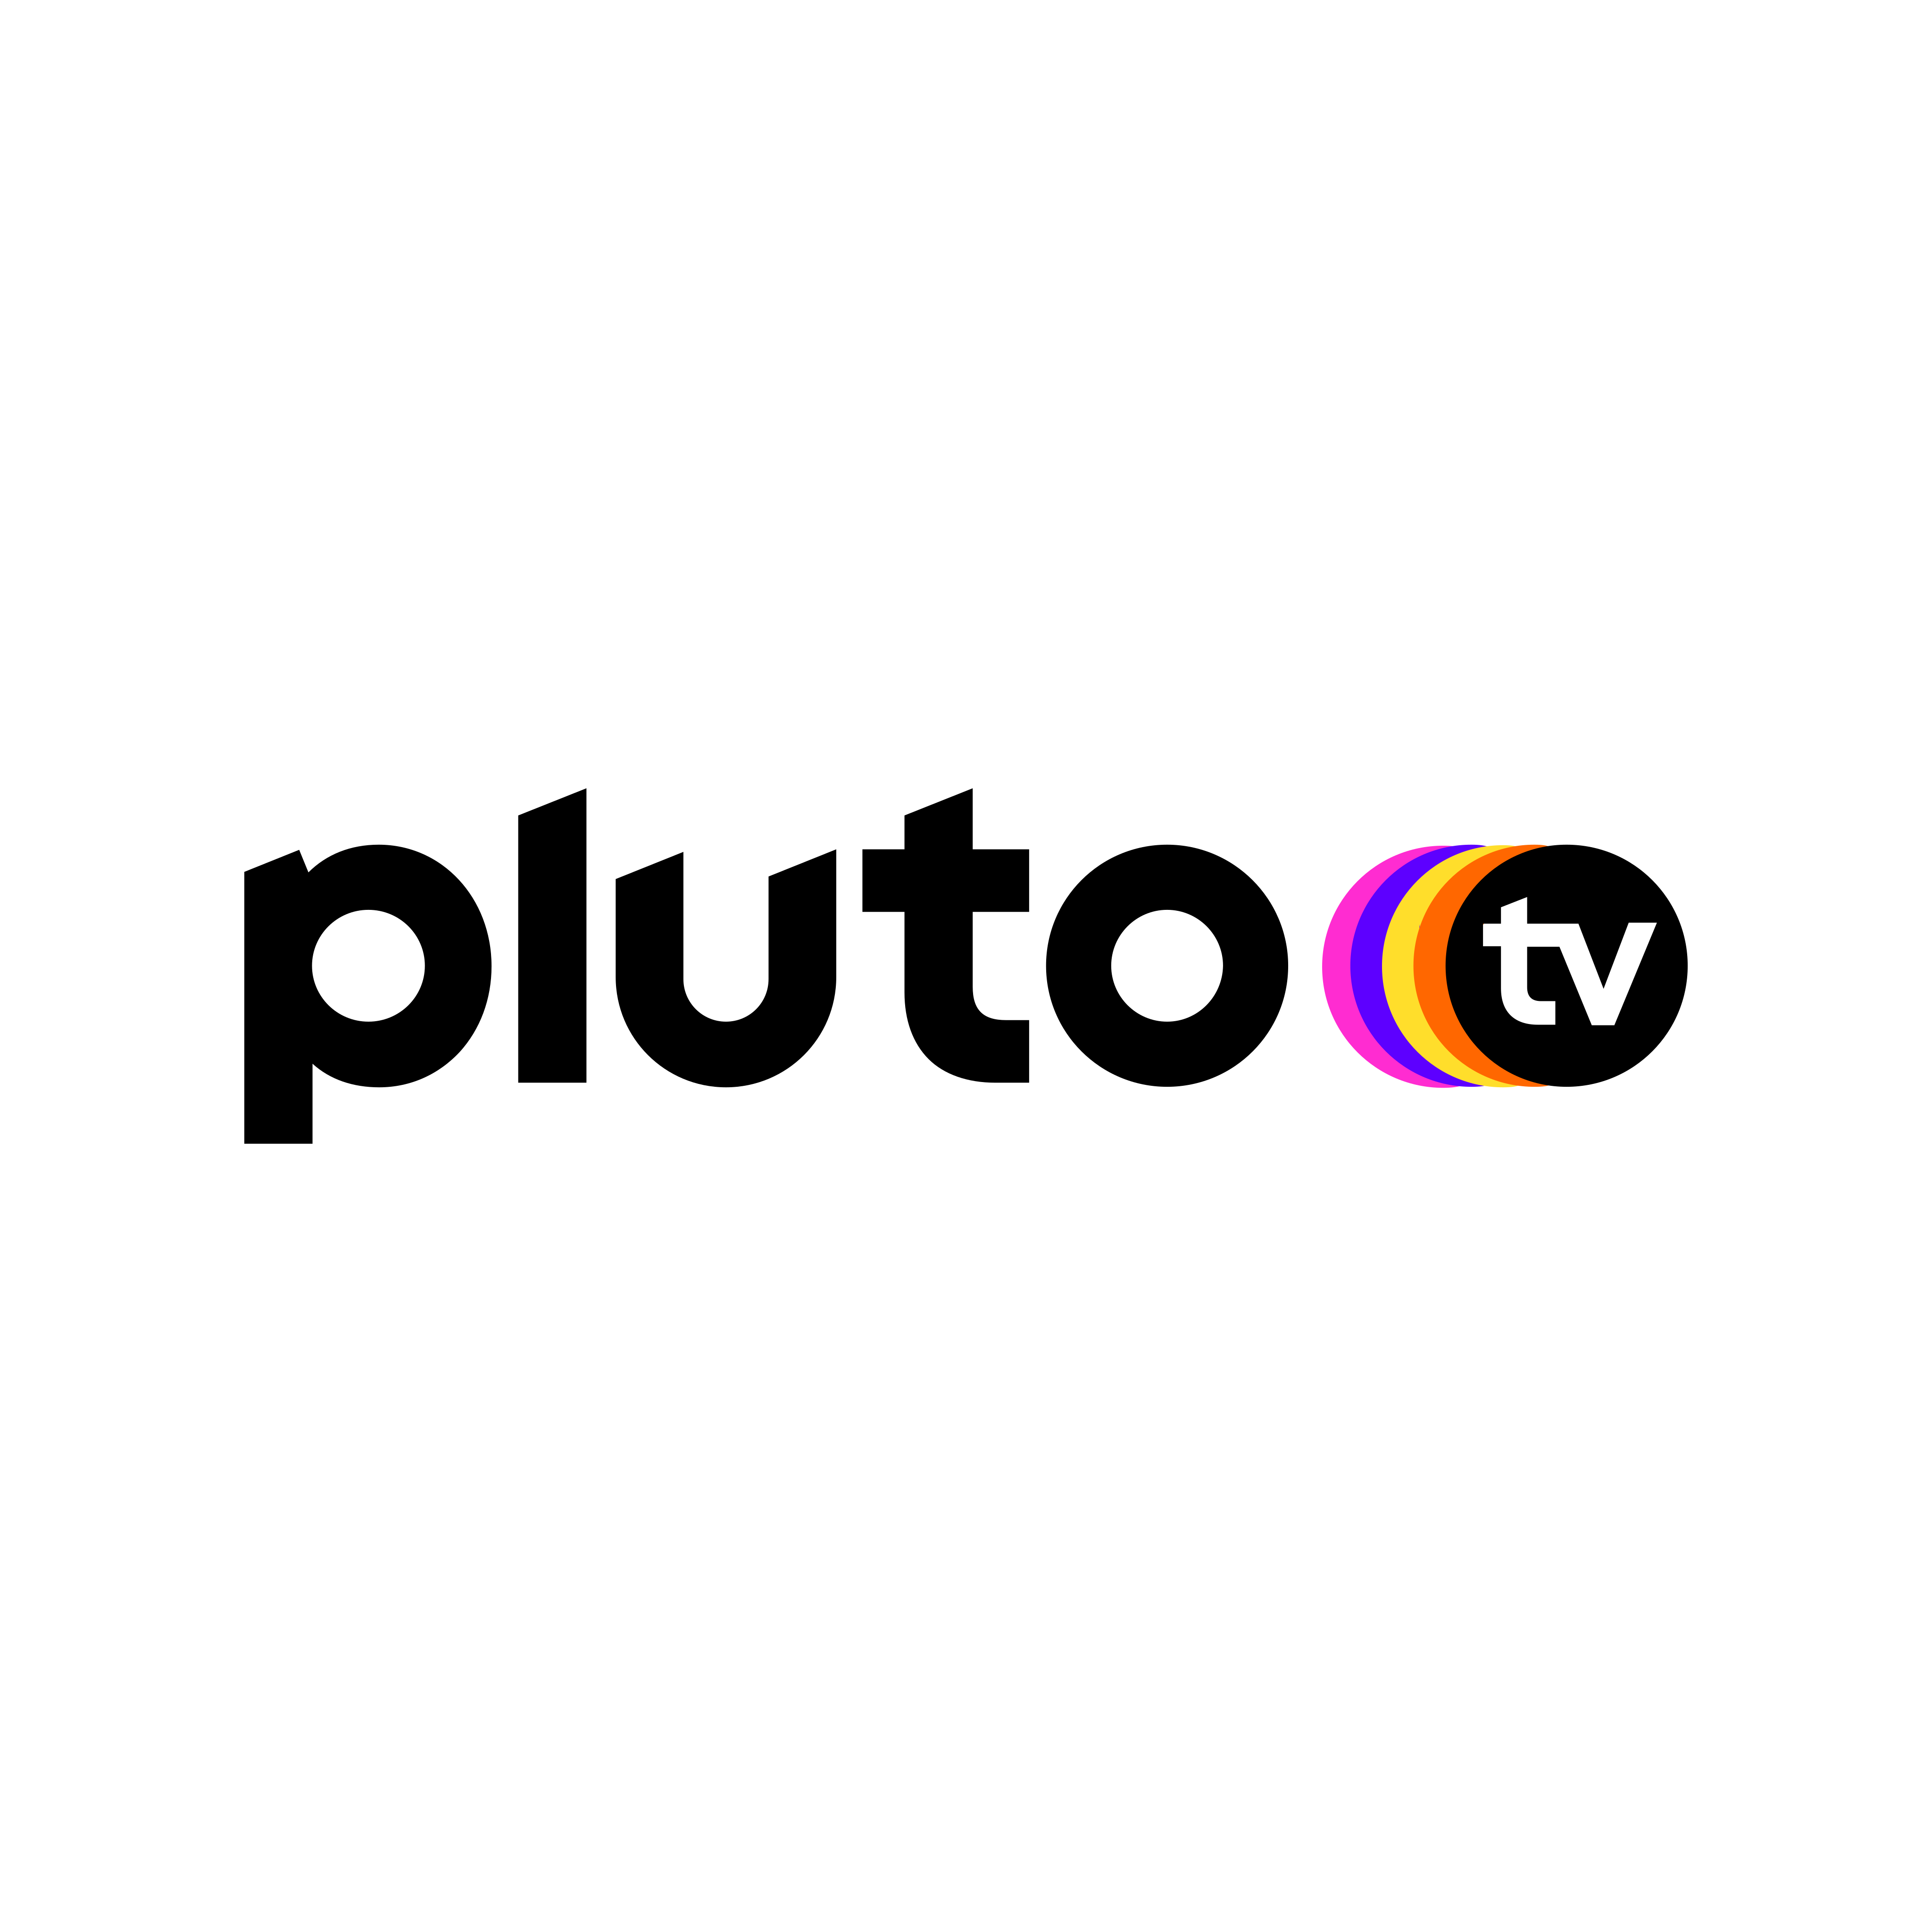 pluto tv logo 0 - Pluto TV Logo